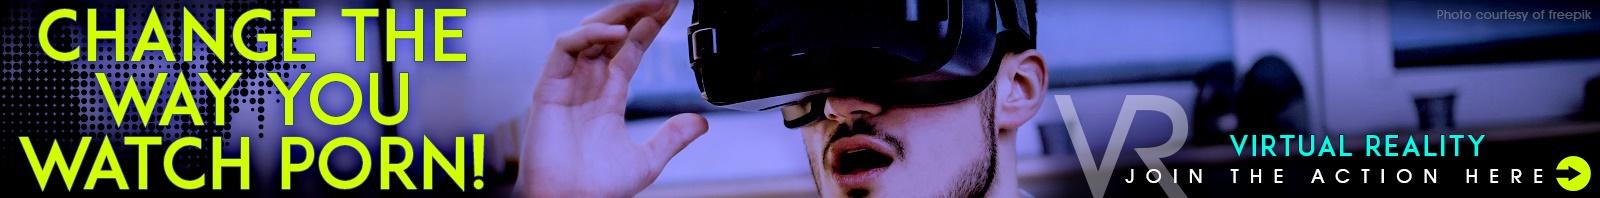 Browse virtual reality porn videos.